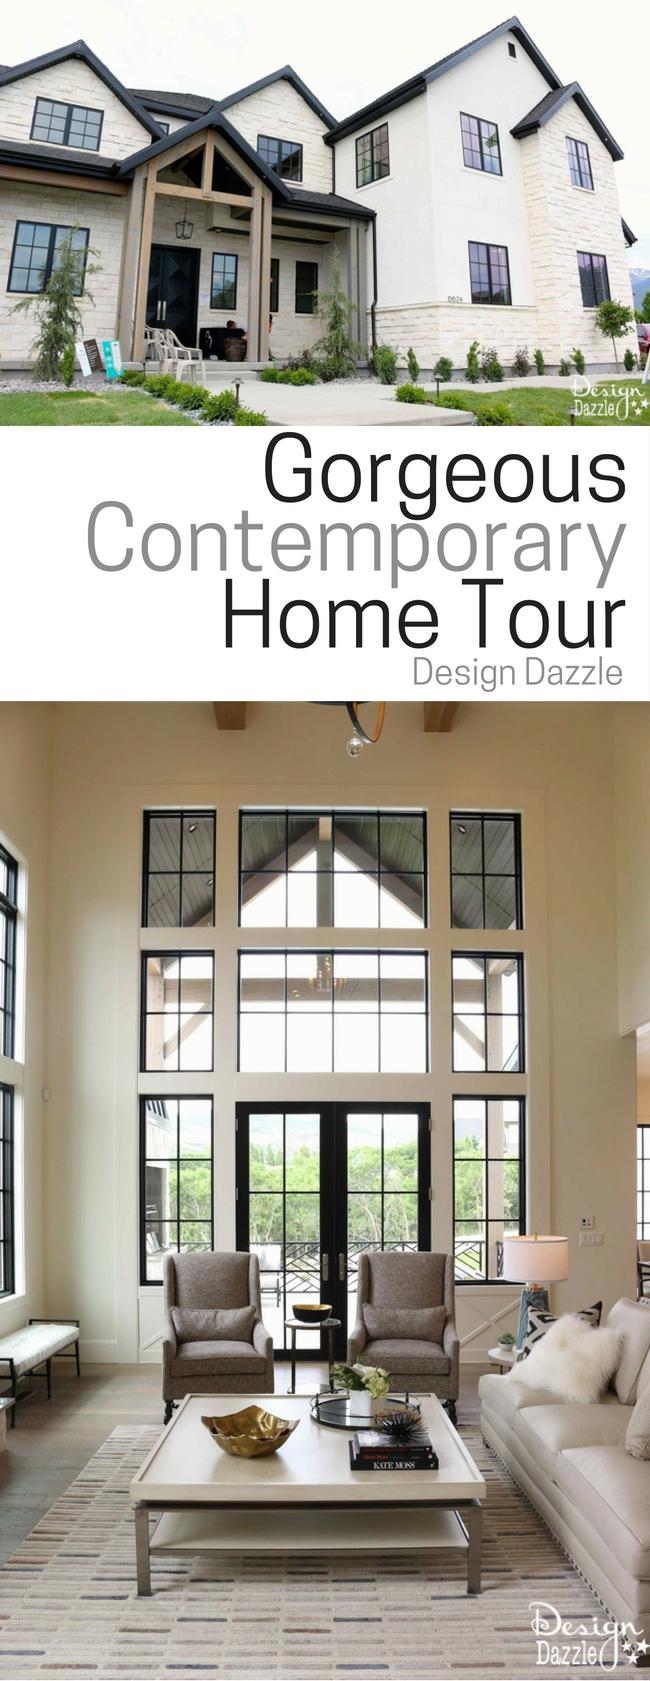 Gorgeous Contemporary Home Tour! Beautiful home decor ideas.  #homedecor | Design Dazzle